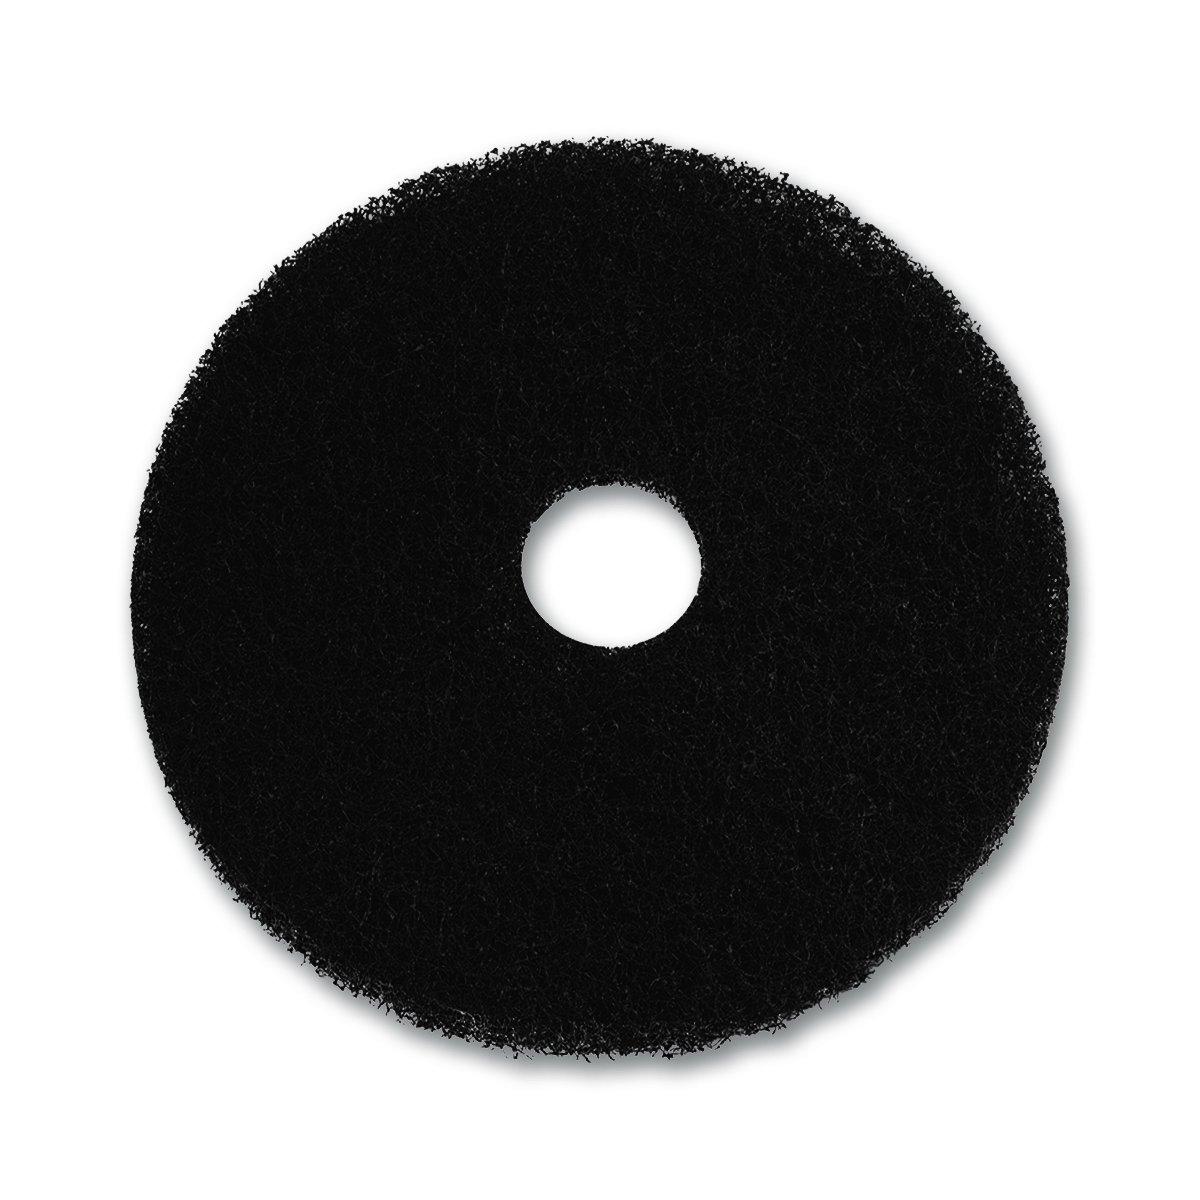 UltraSource Floor Stripping Pad, 17'', Black (Pack of 5)